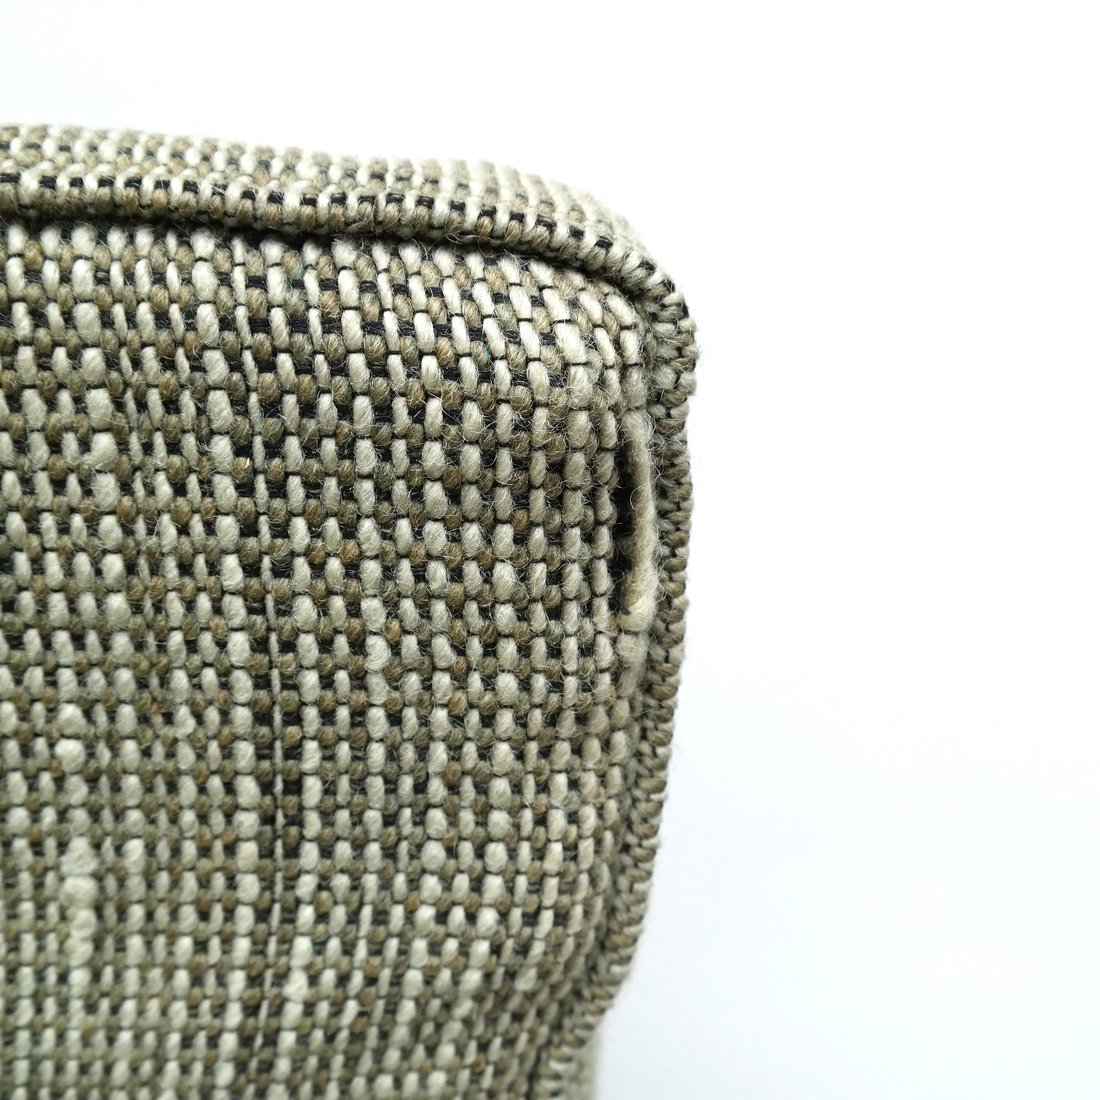 Knoll Green Upholstered Sofa - 7